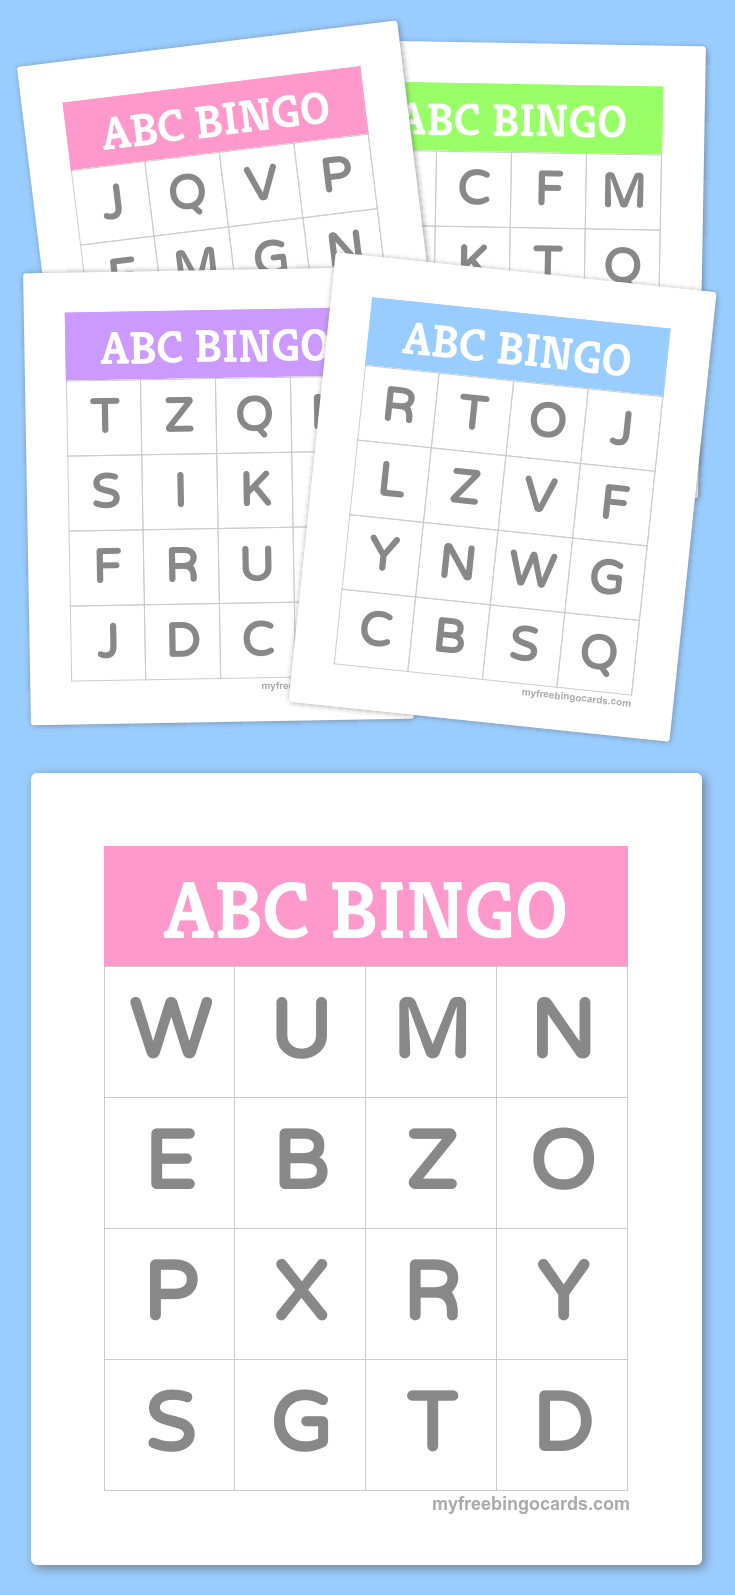 Free Printable Bingo Cards | Bingo Cards | Pinterest | Preschool - Free Printable Spanish Bingo Cards